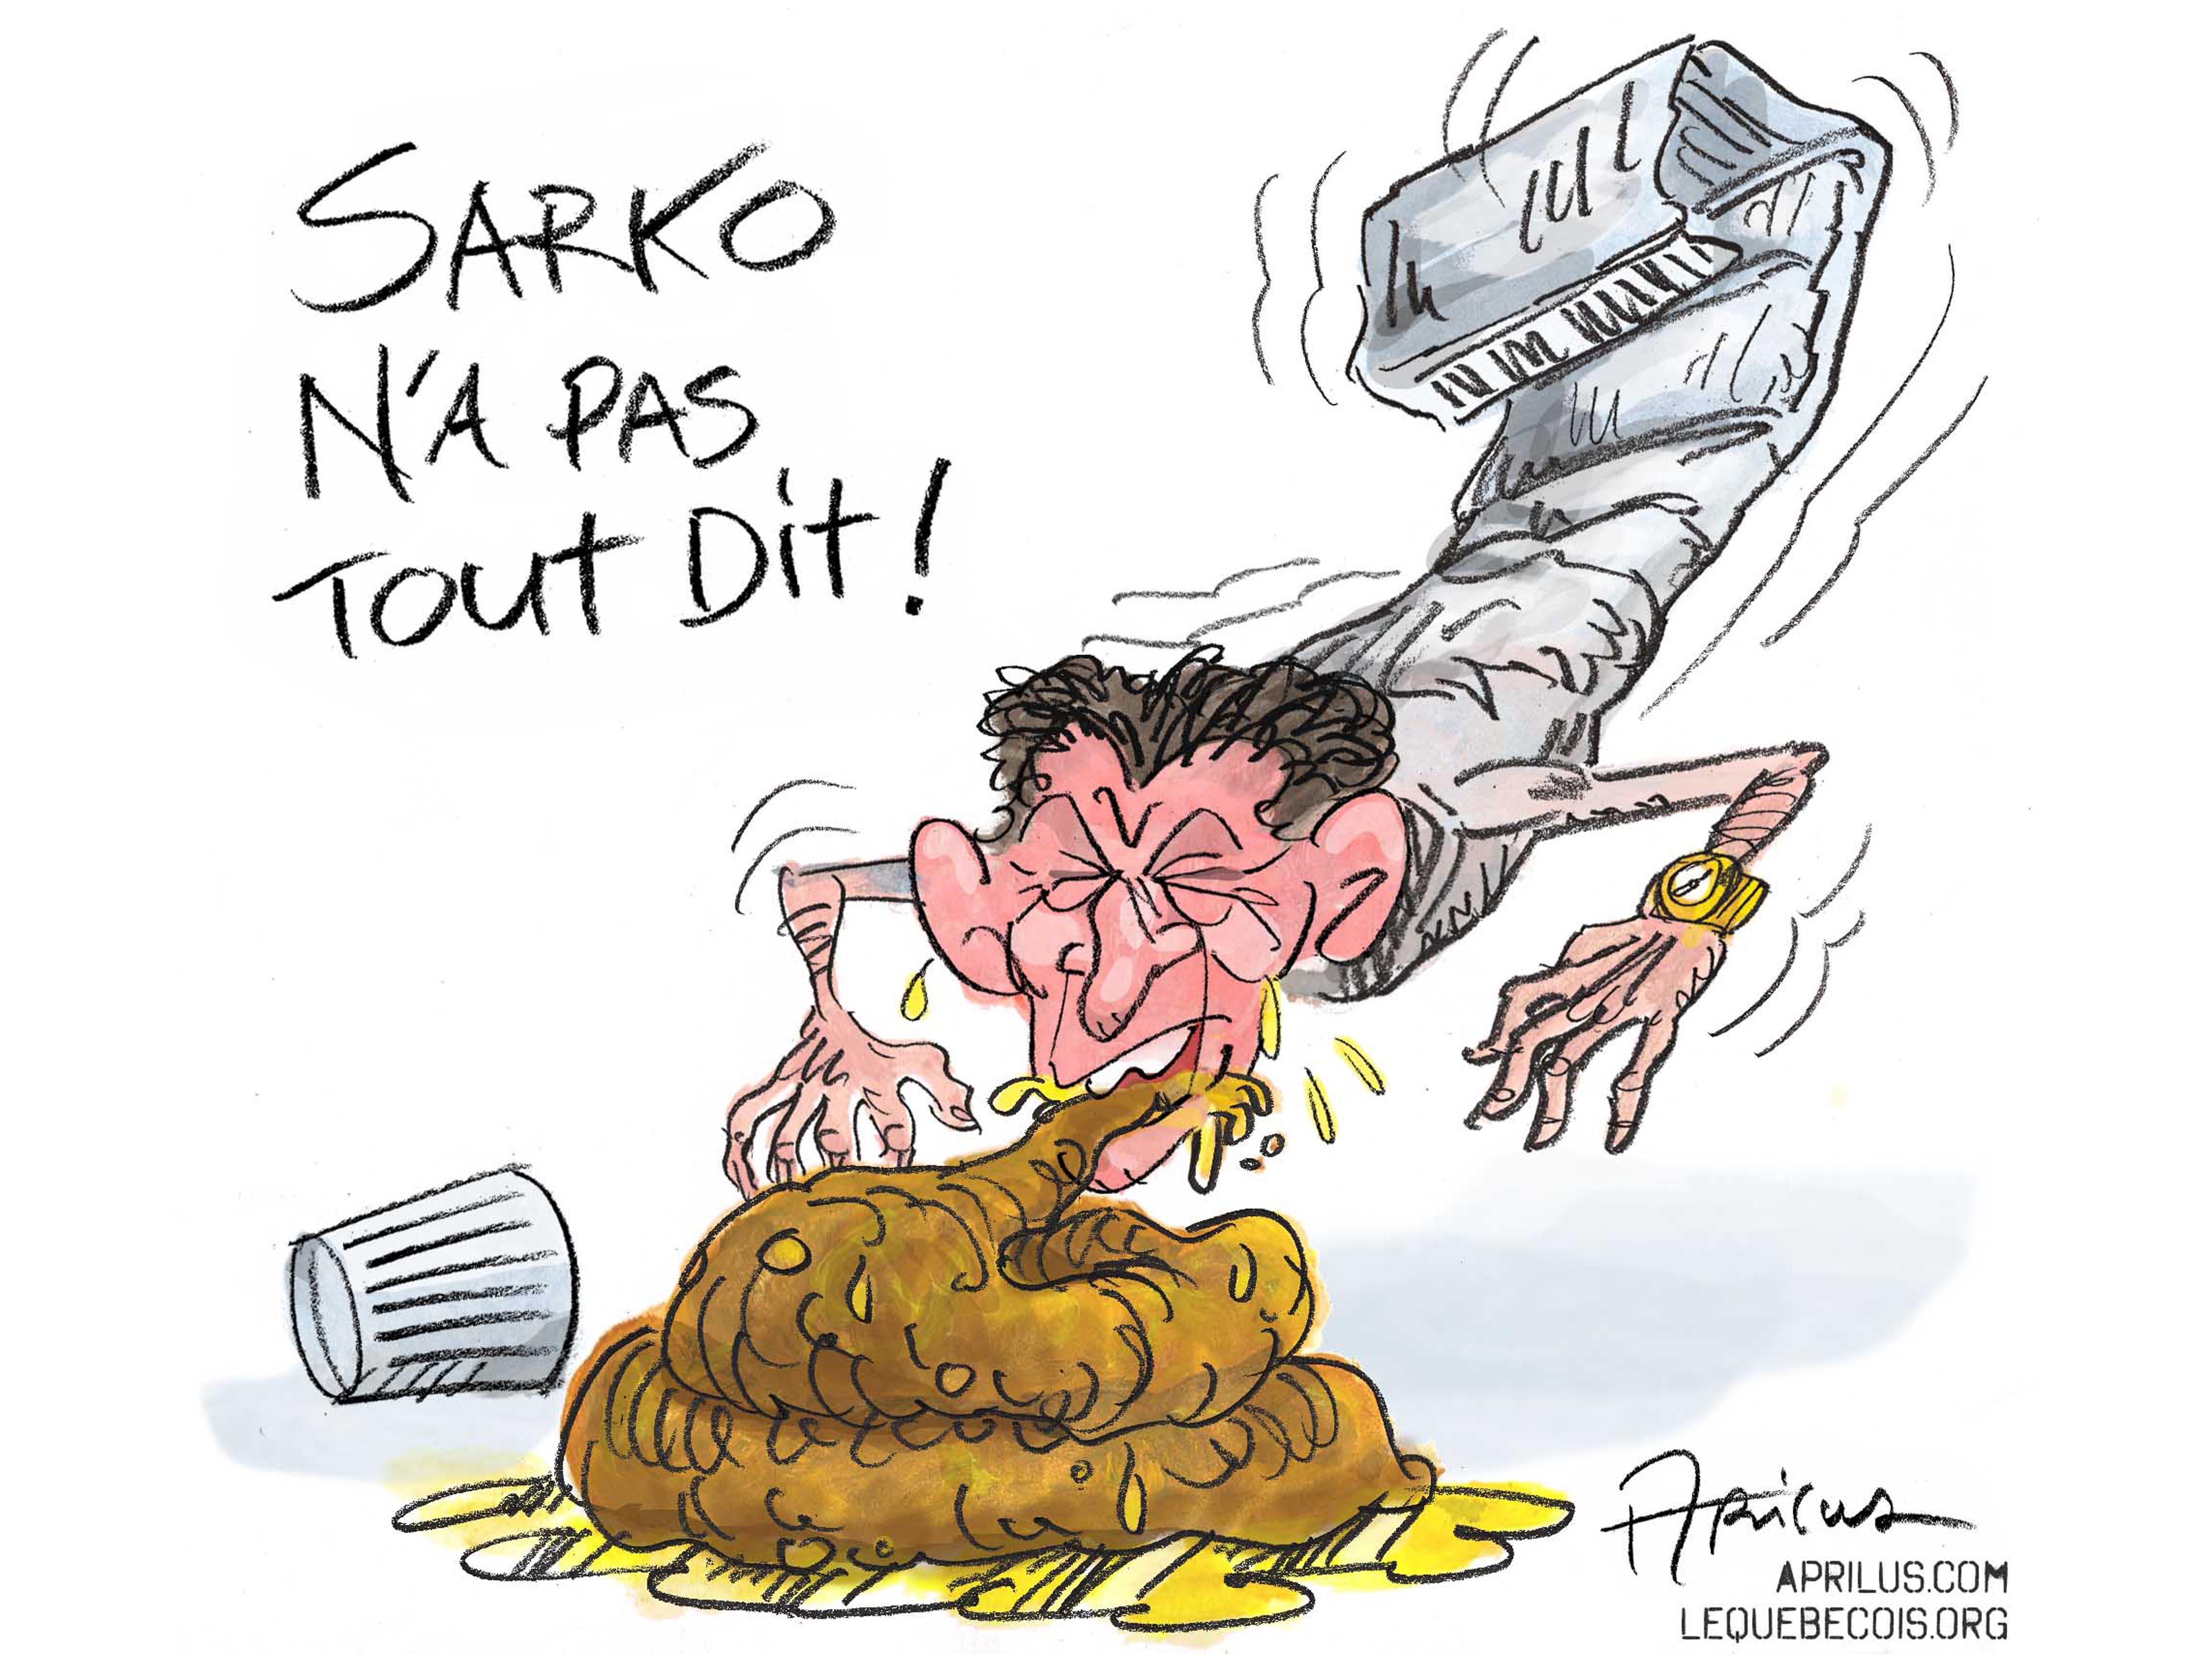 sarko-aprilus-le-qc